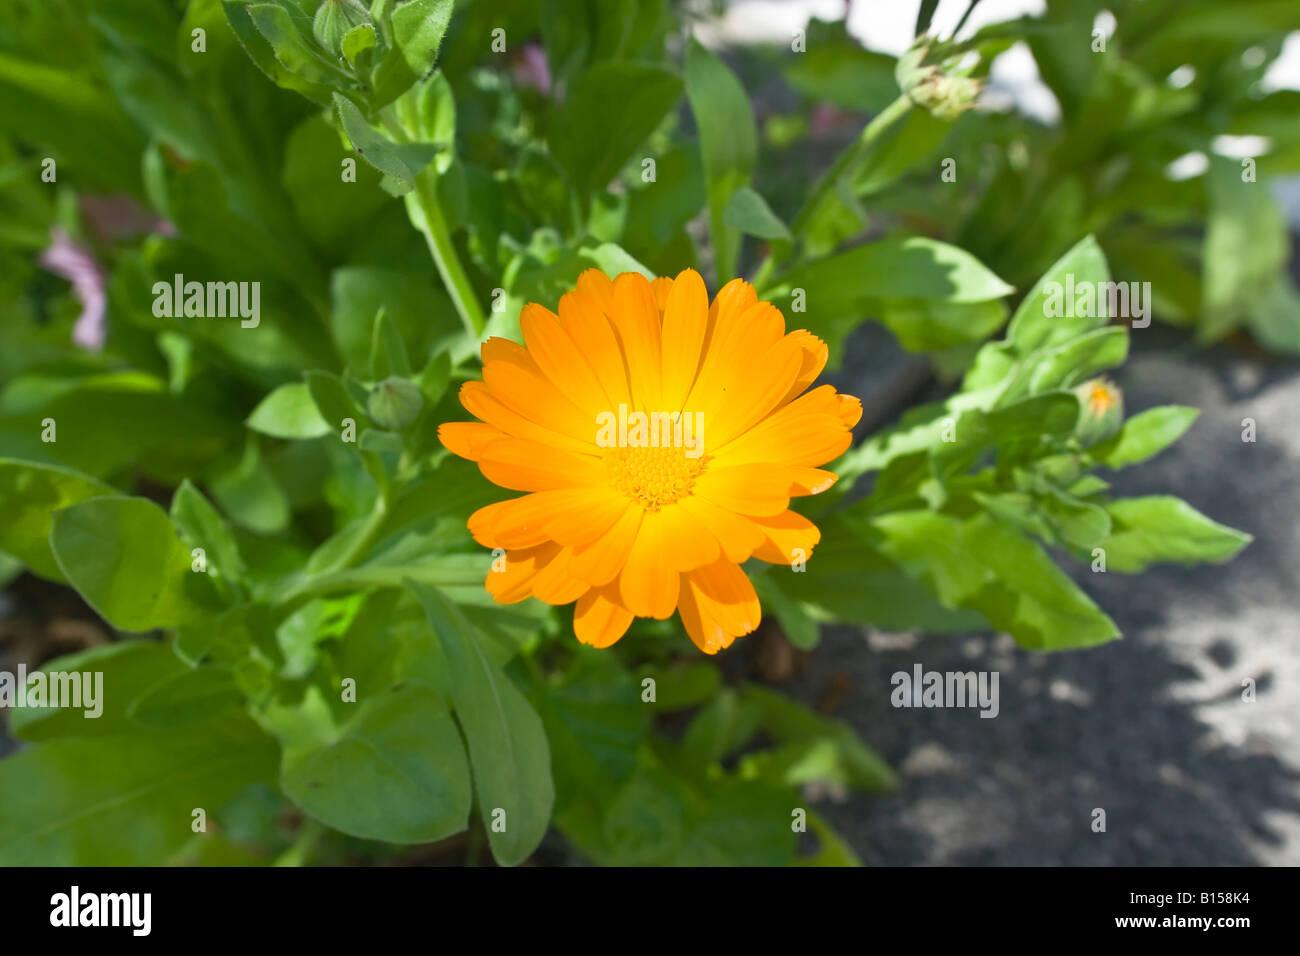 Calendula marigold - Stock Image